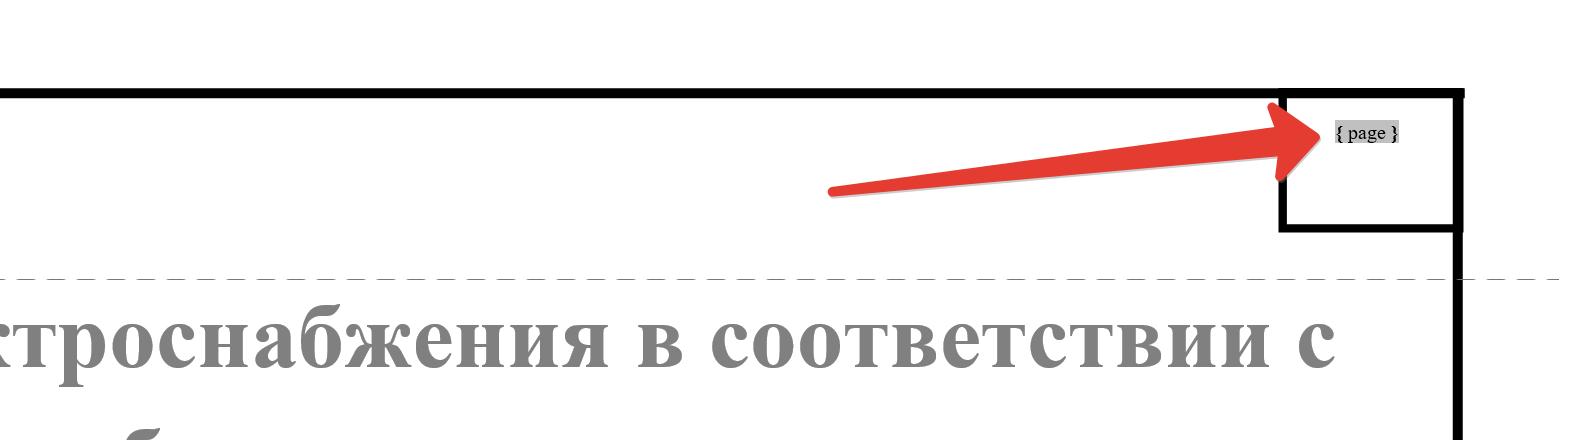 скрытый код номера